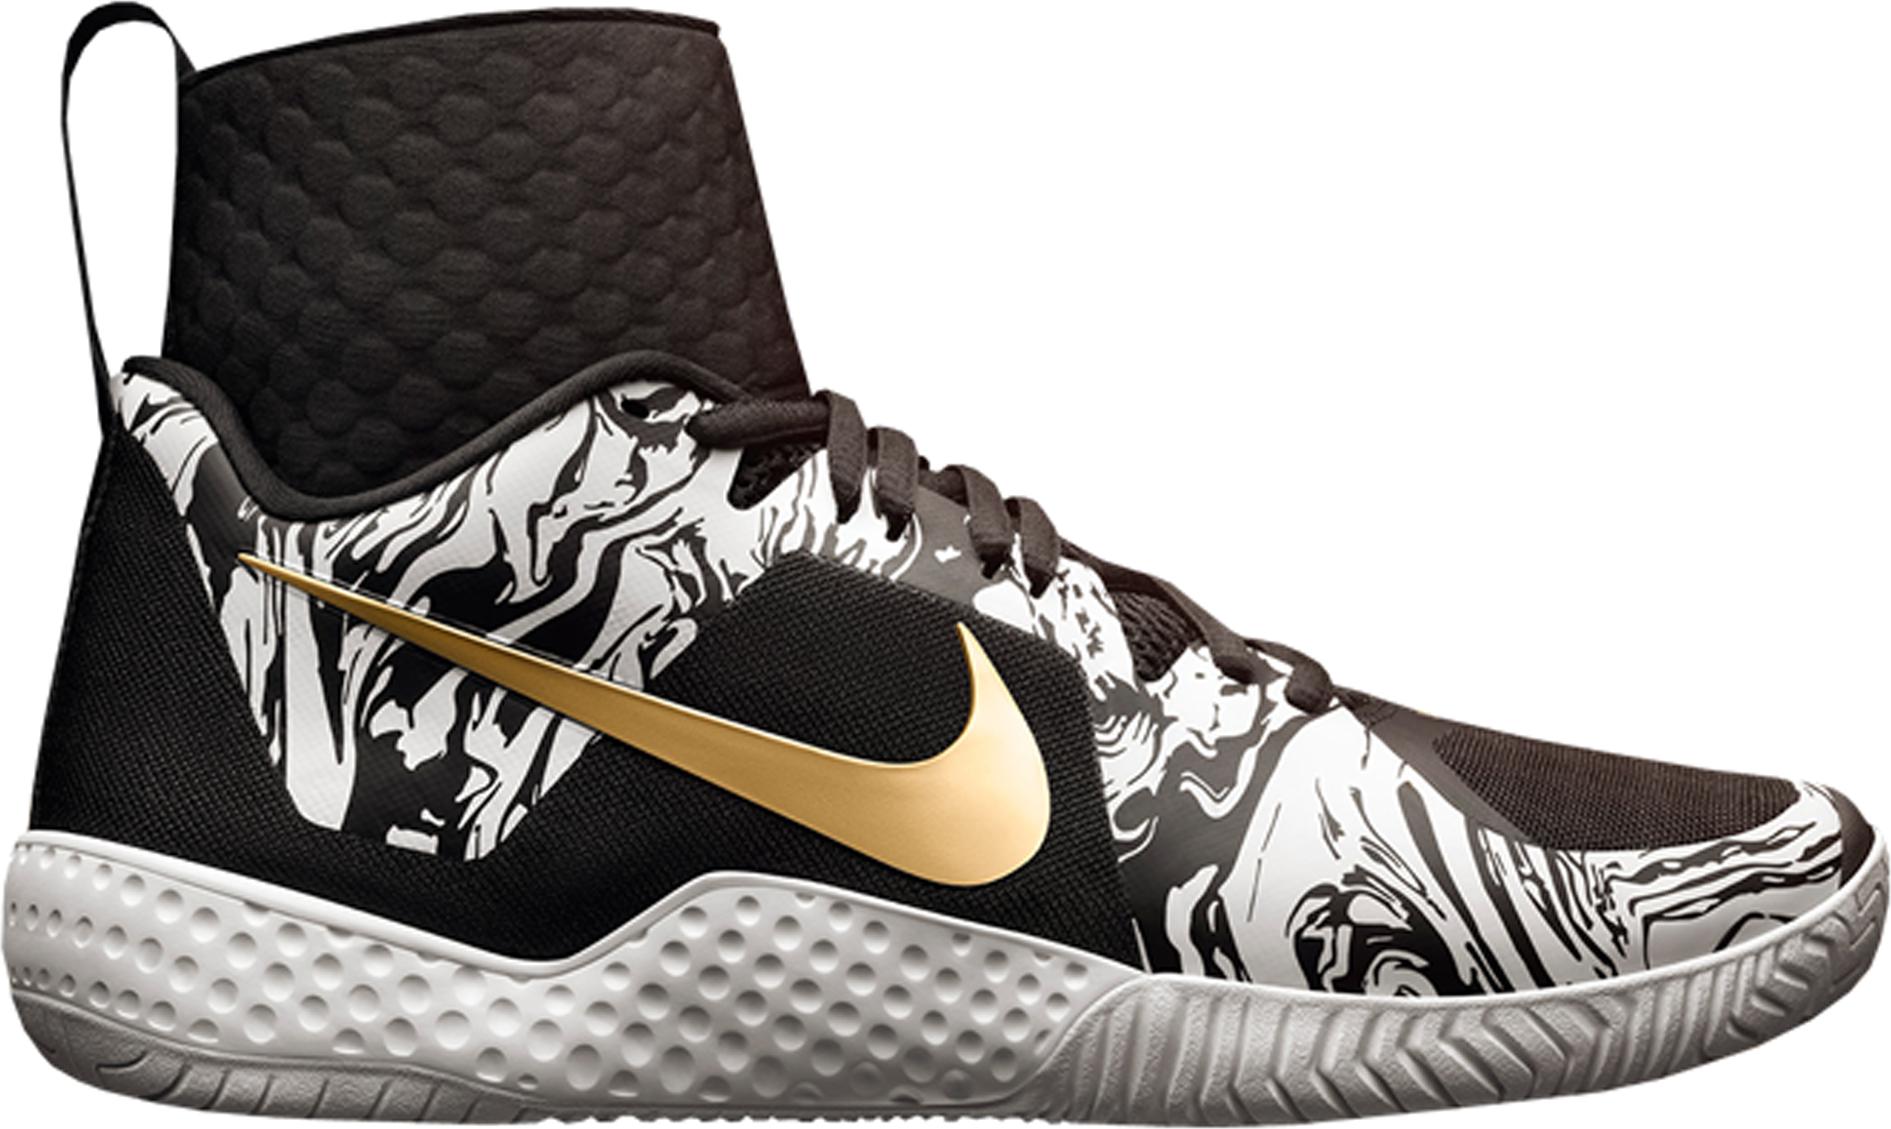 Nike Court Flare BHM 2017 (W) - 848453-100